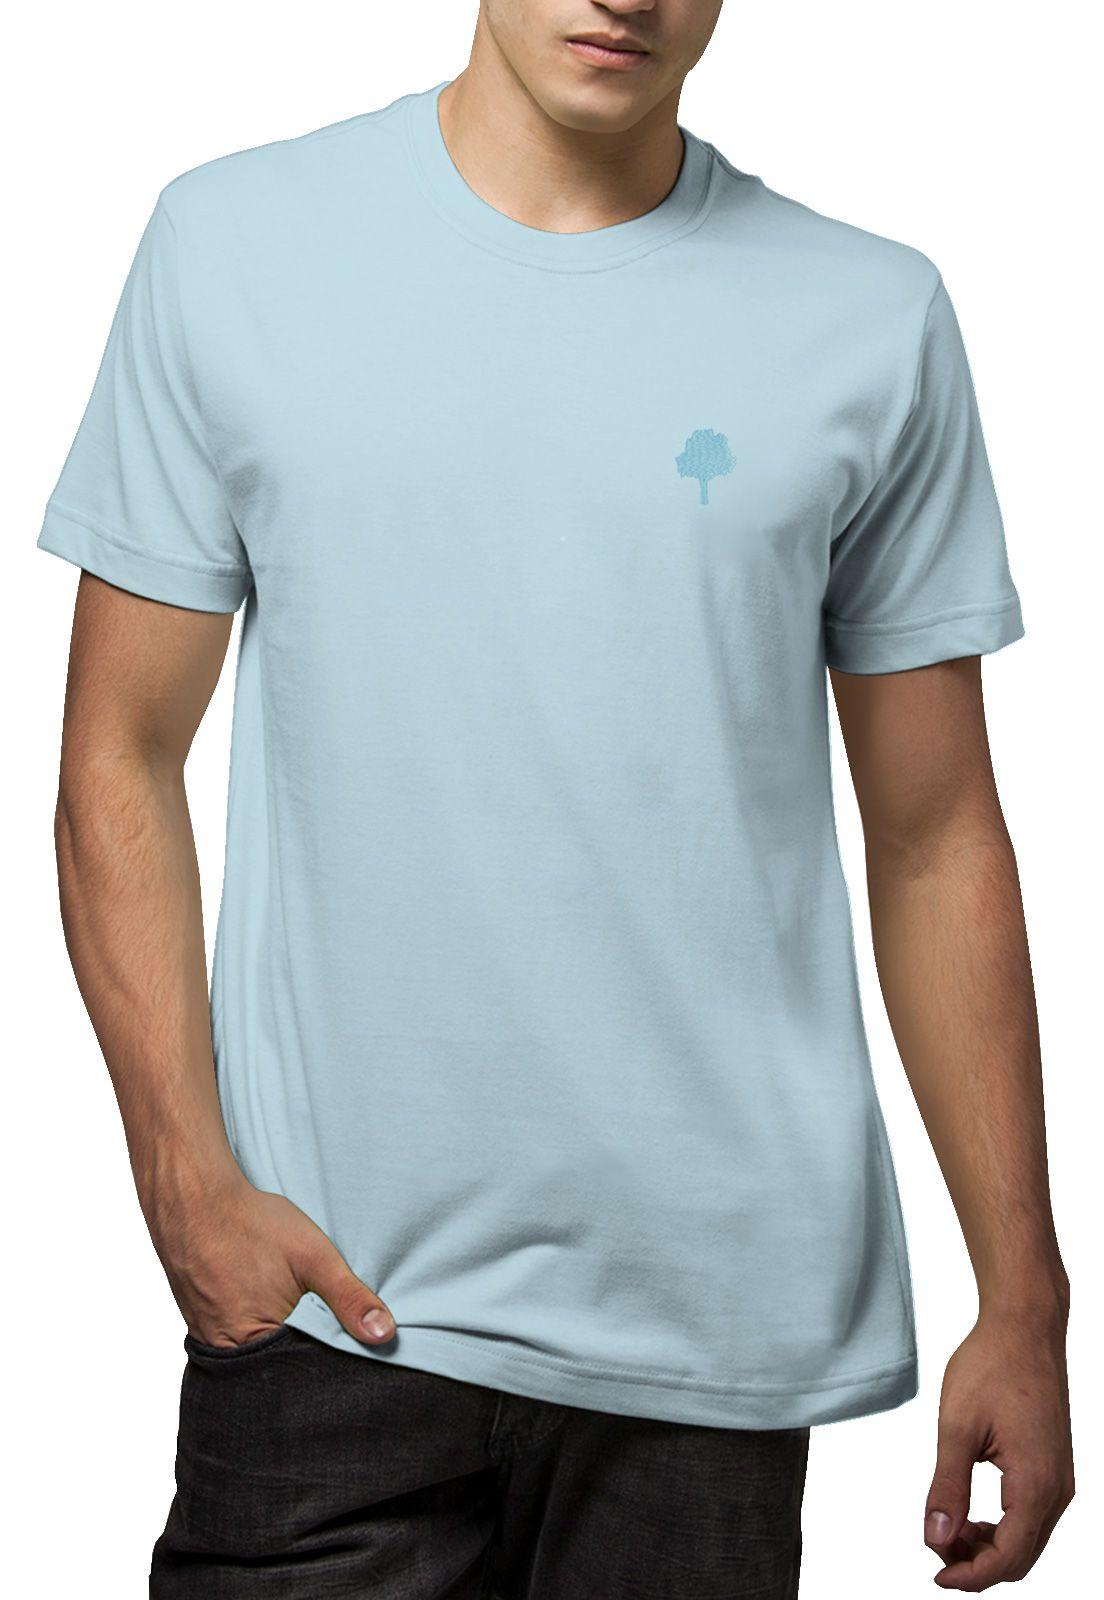 Camiseta Amazônia Básica Árvore Bordada - Azul Claro